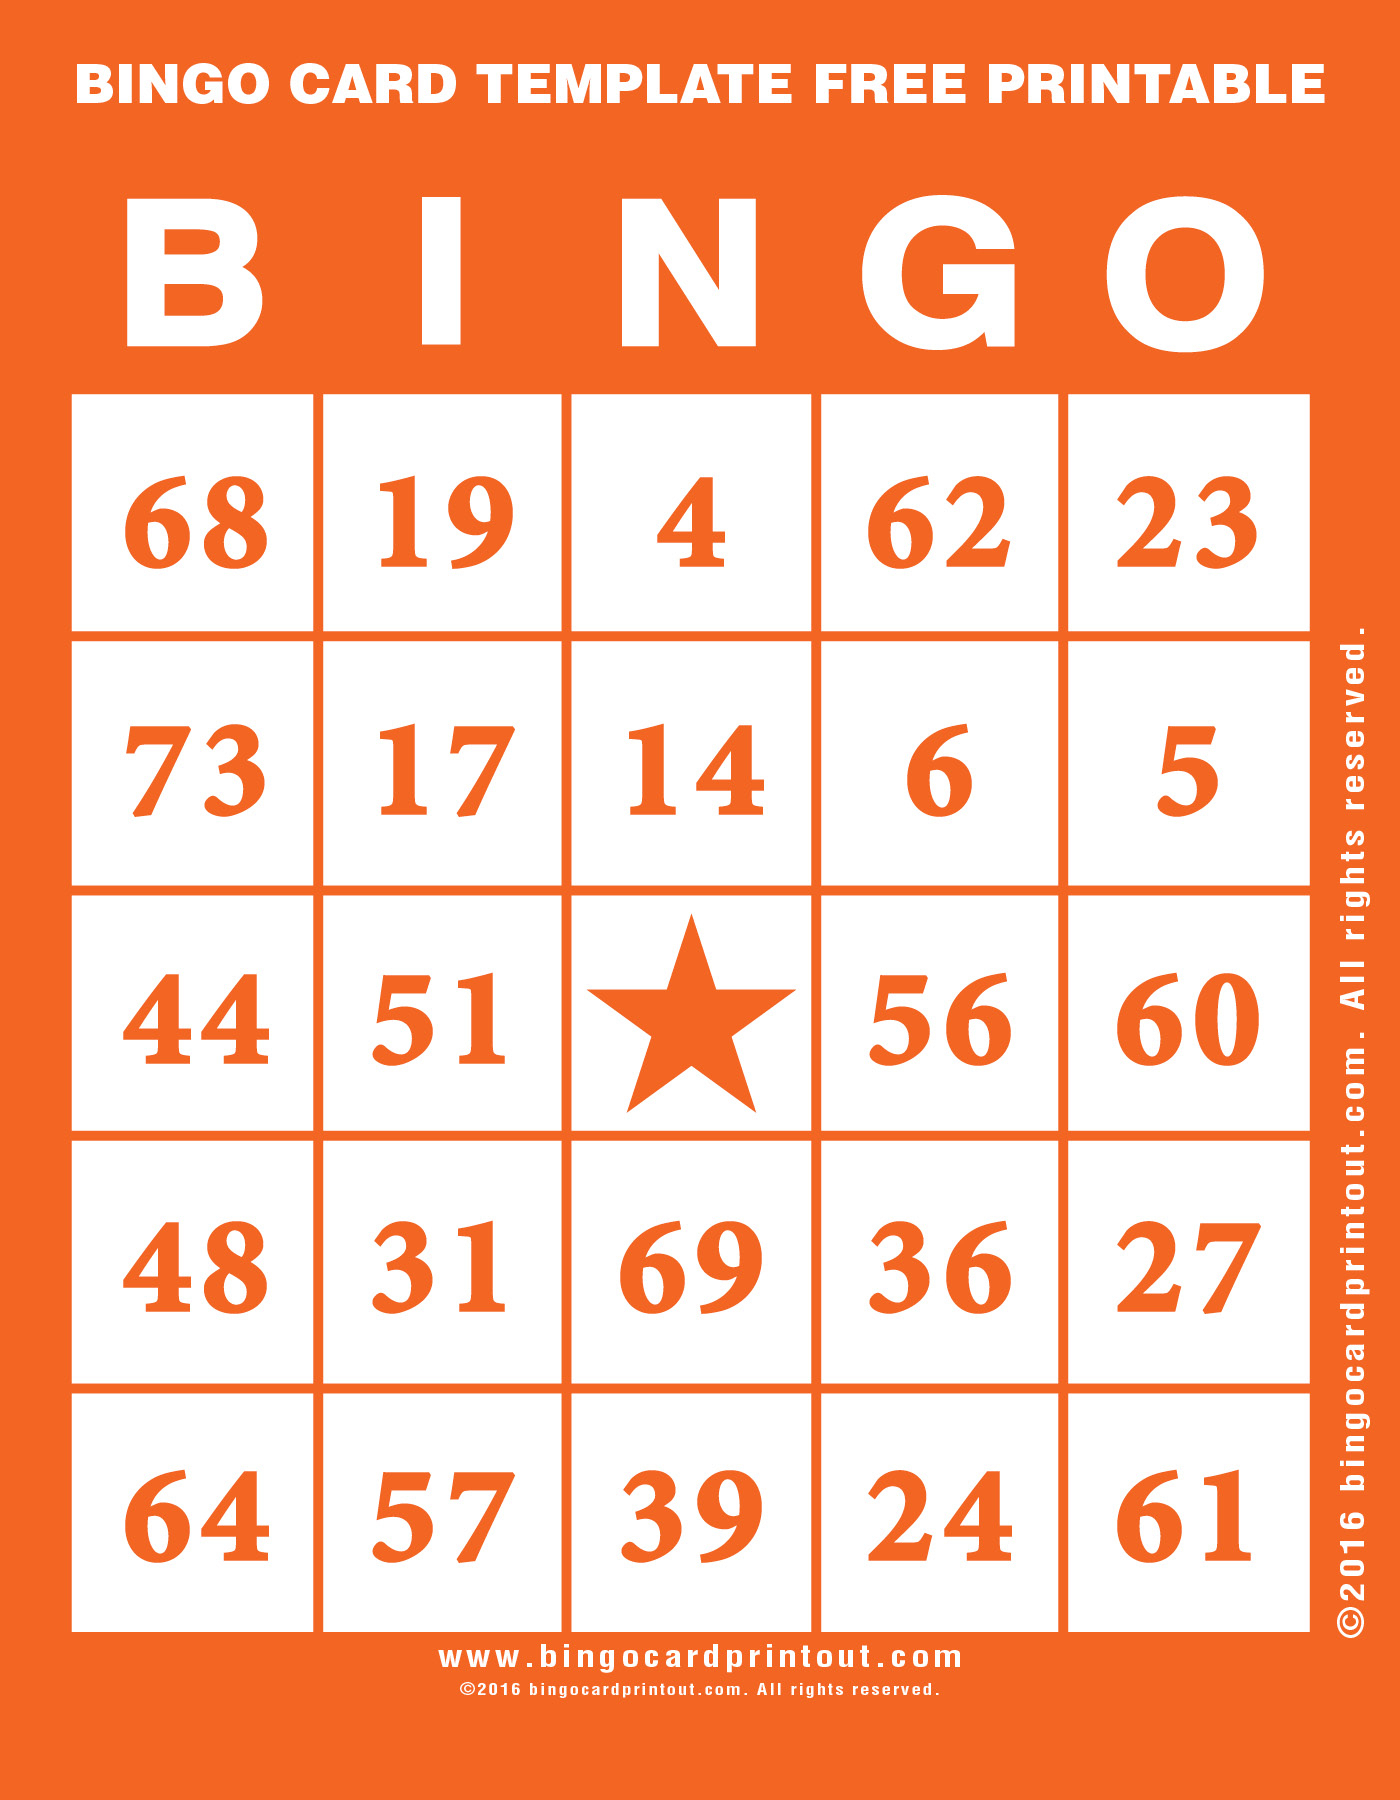 Bingo Card Template Free Printable - Bingocardprintout - Free Printable Bingo Cards